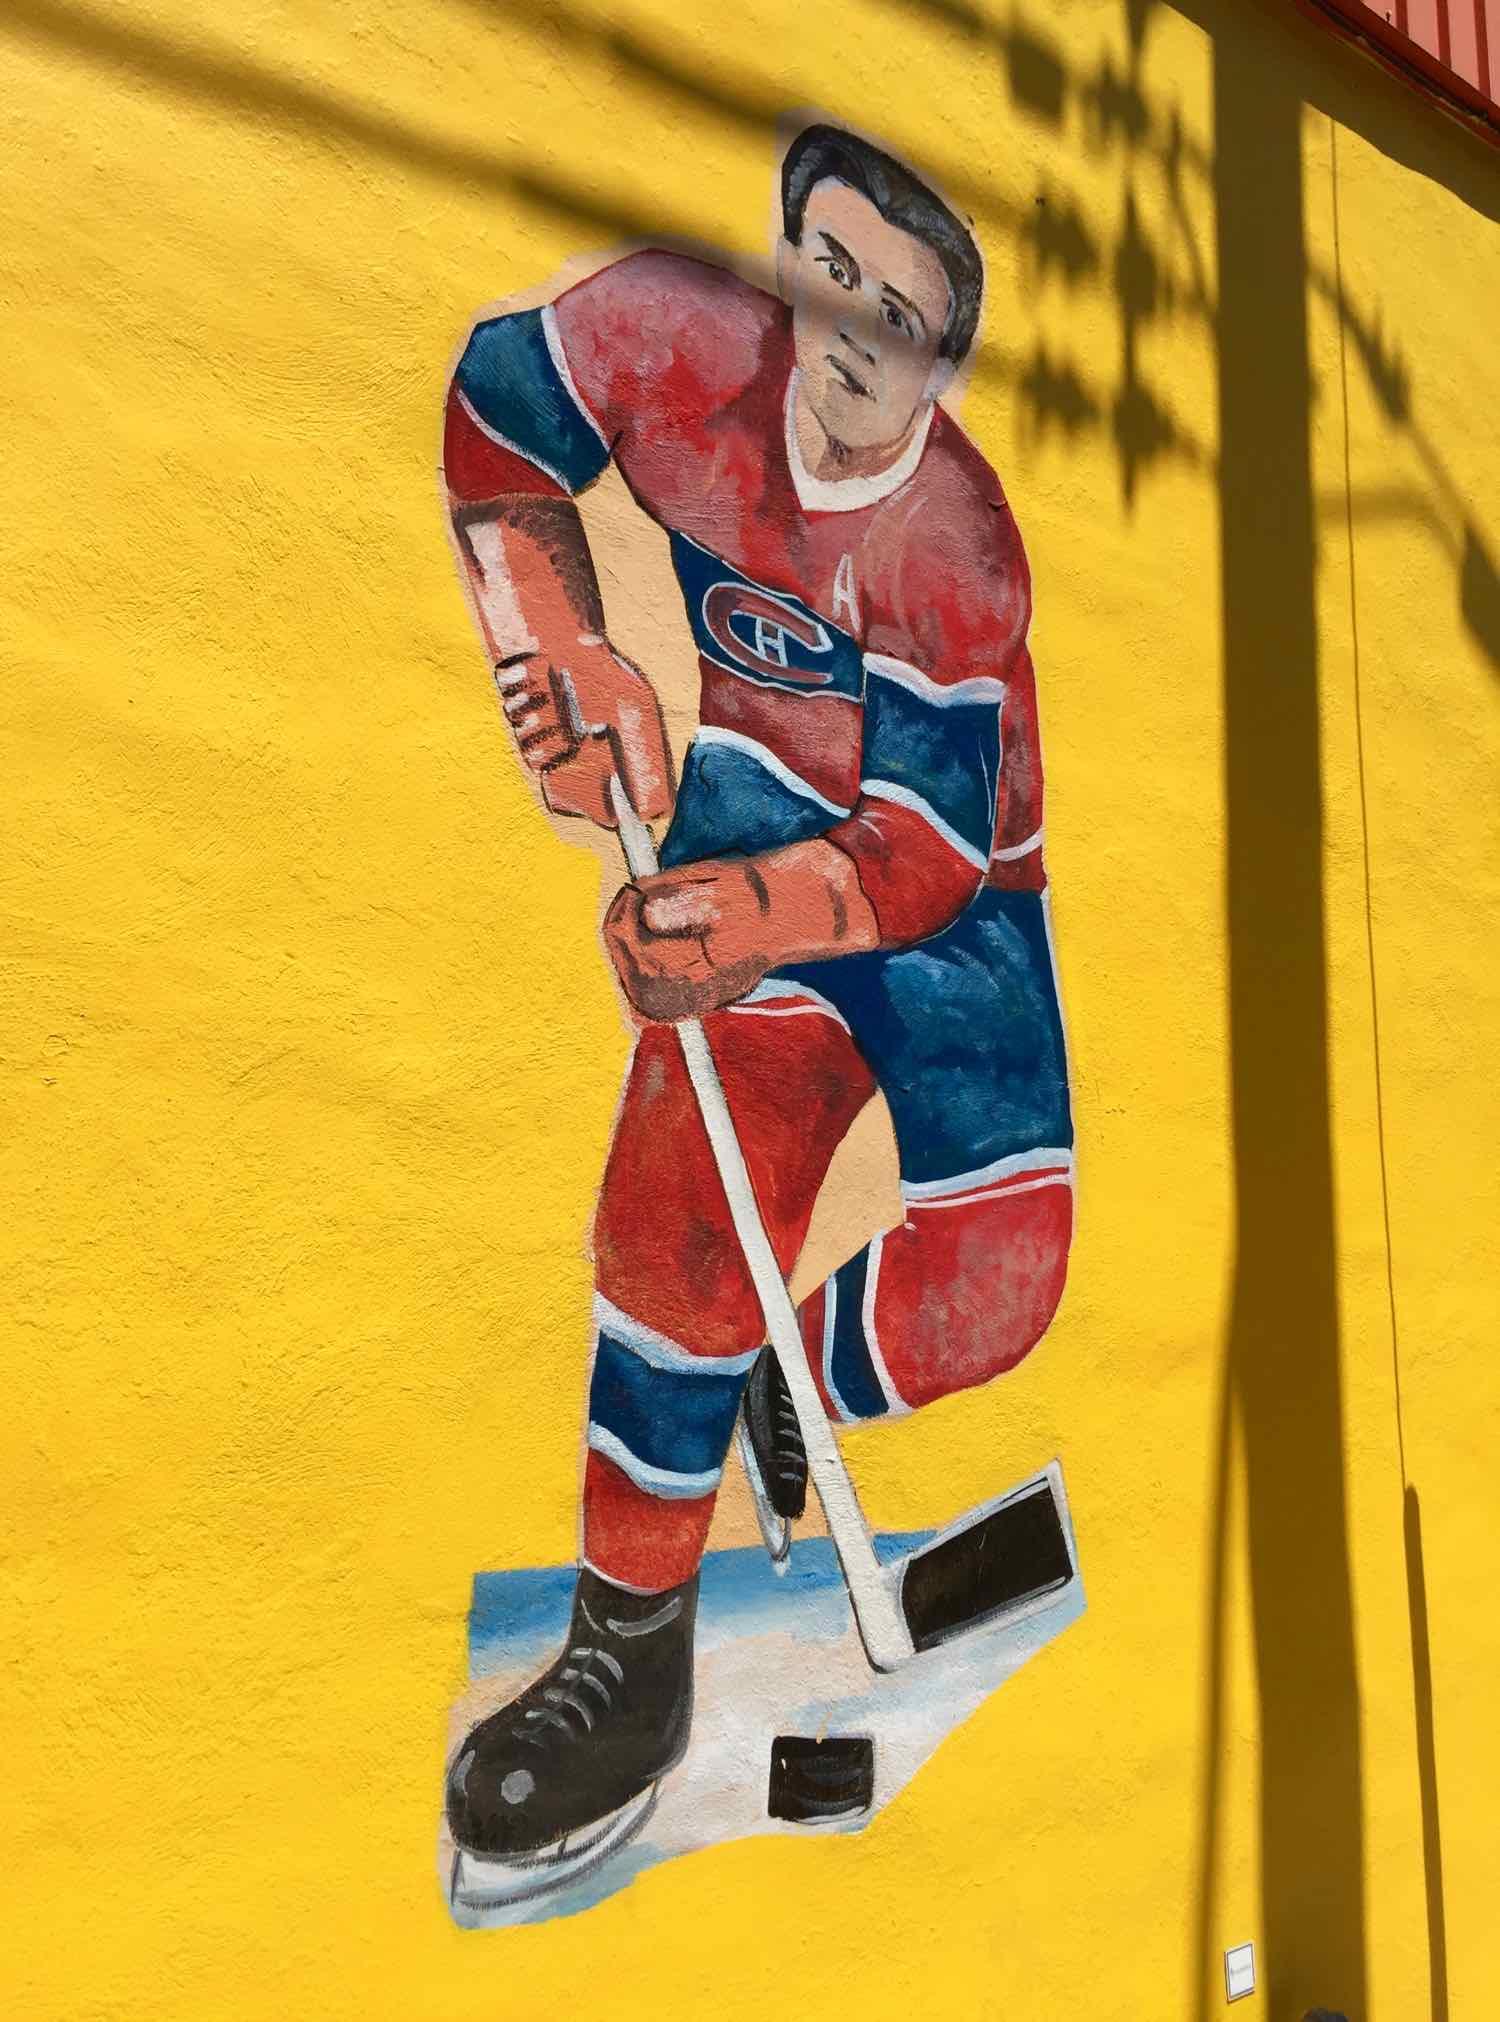 The_Walls_Of_Montreal-Ezra_Soiferman - 24.jpg